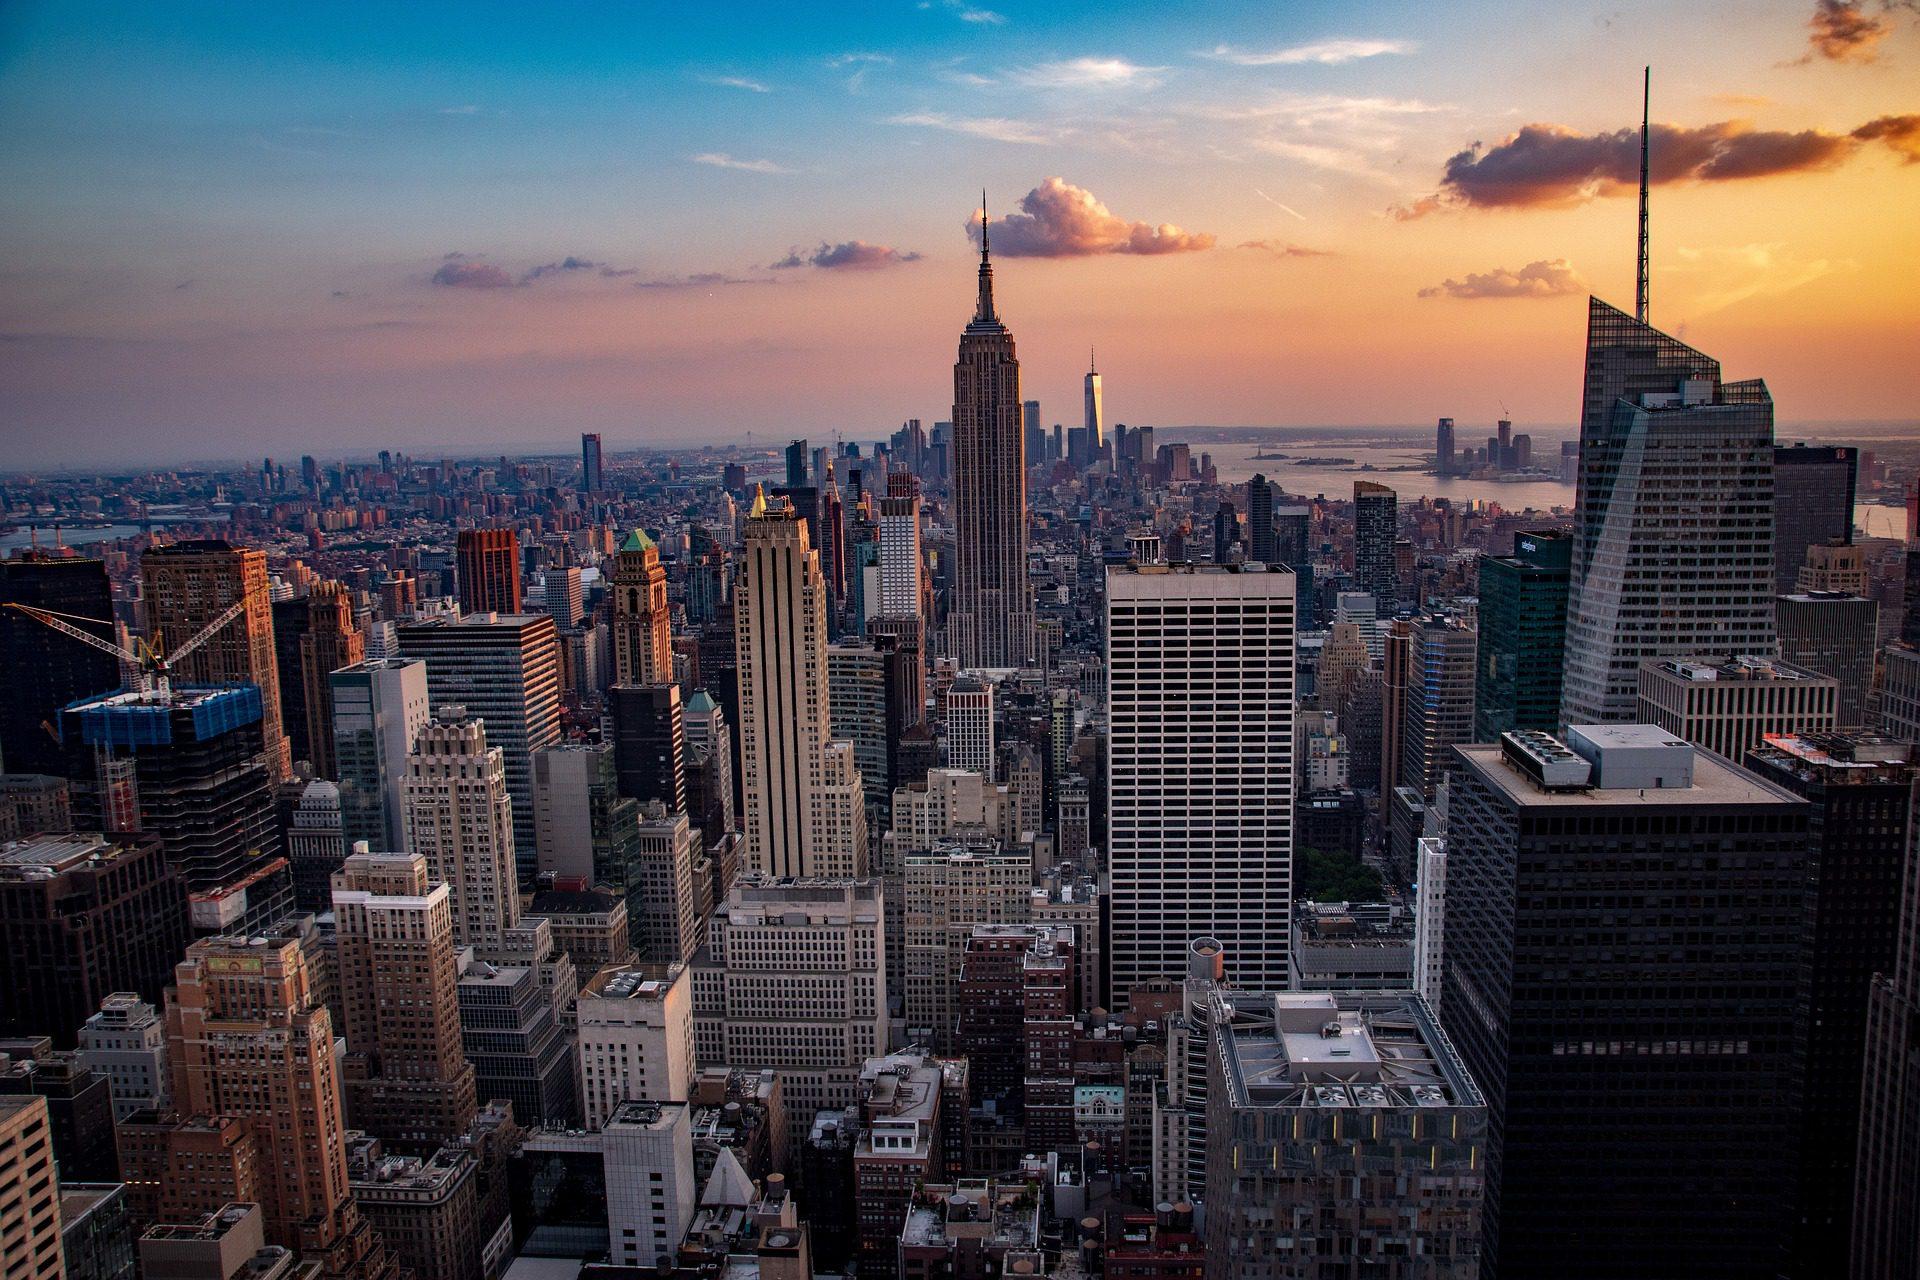 Manhattan Skyline at night, NYC